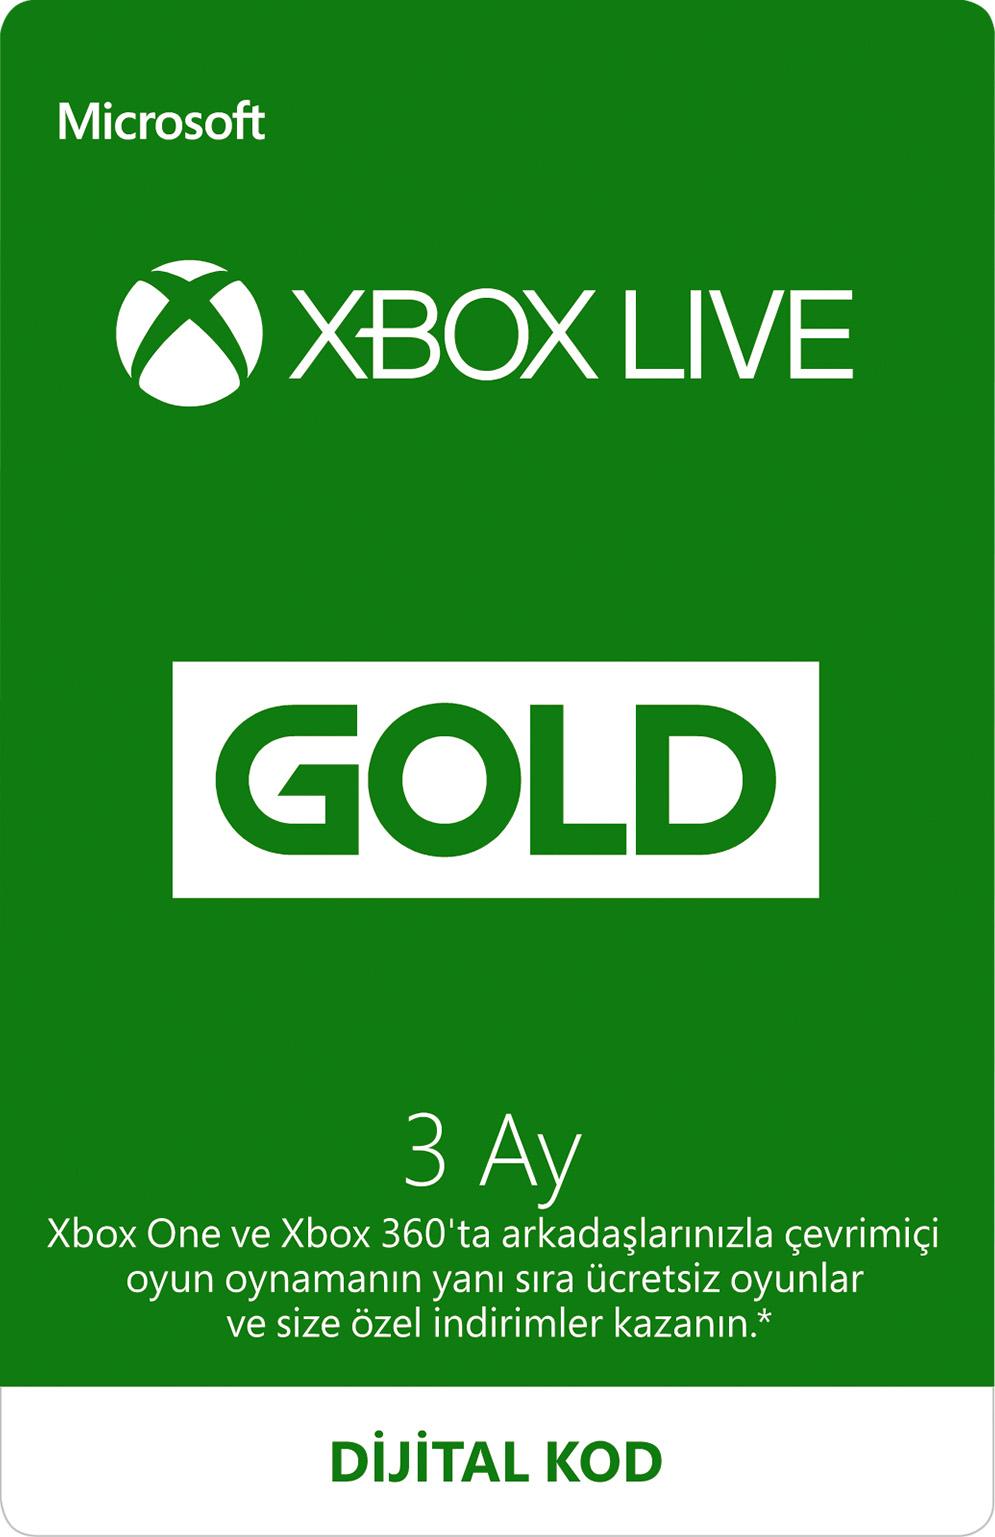 Xbox Live Gold Üyeliği - 3 ay (Dijital Kod)